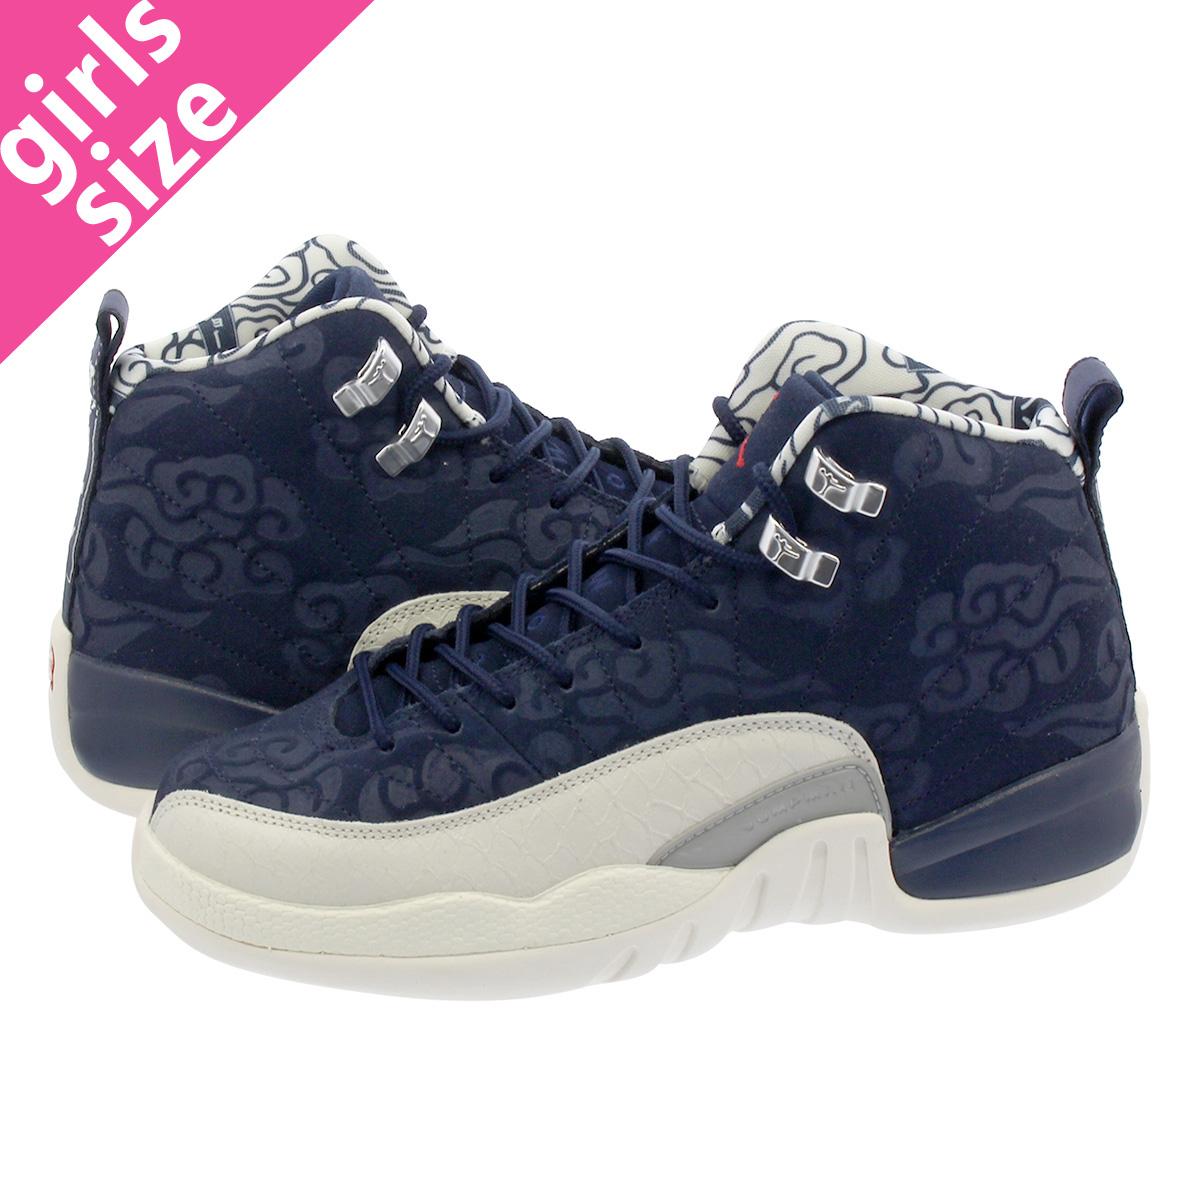 312462108687d9 NIKE AIR JORDAN 12 RETRO GS Nike Air Jordan 12 nostalgic GS COLLEGE  NAVY SAIL UNIVERSITY RED bv8017-445